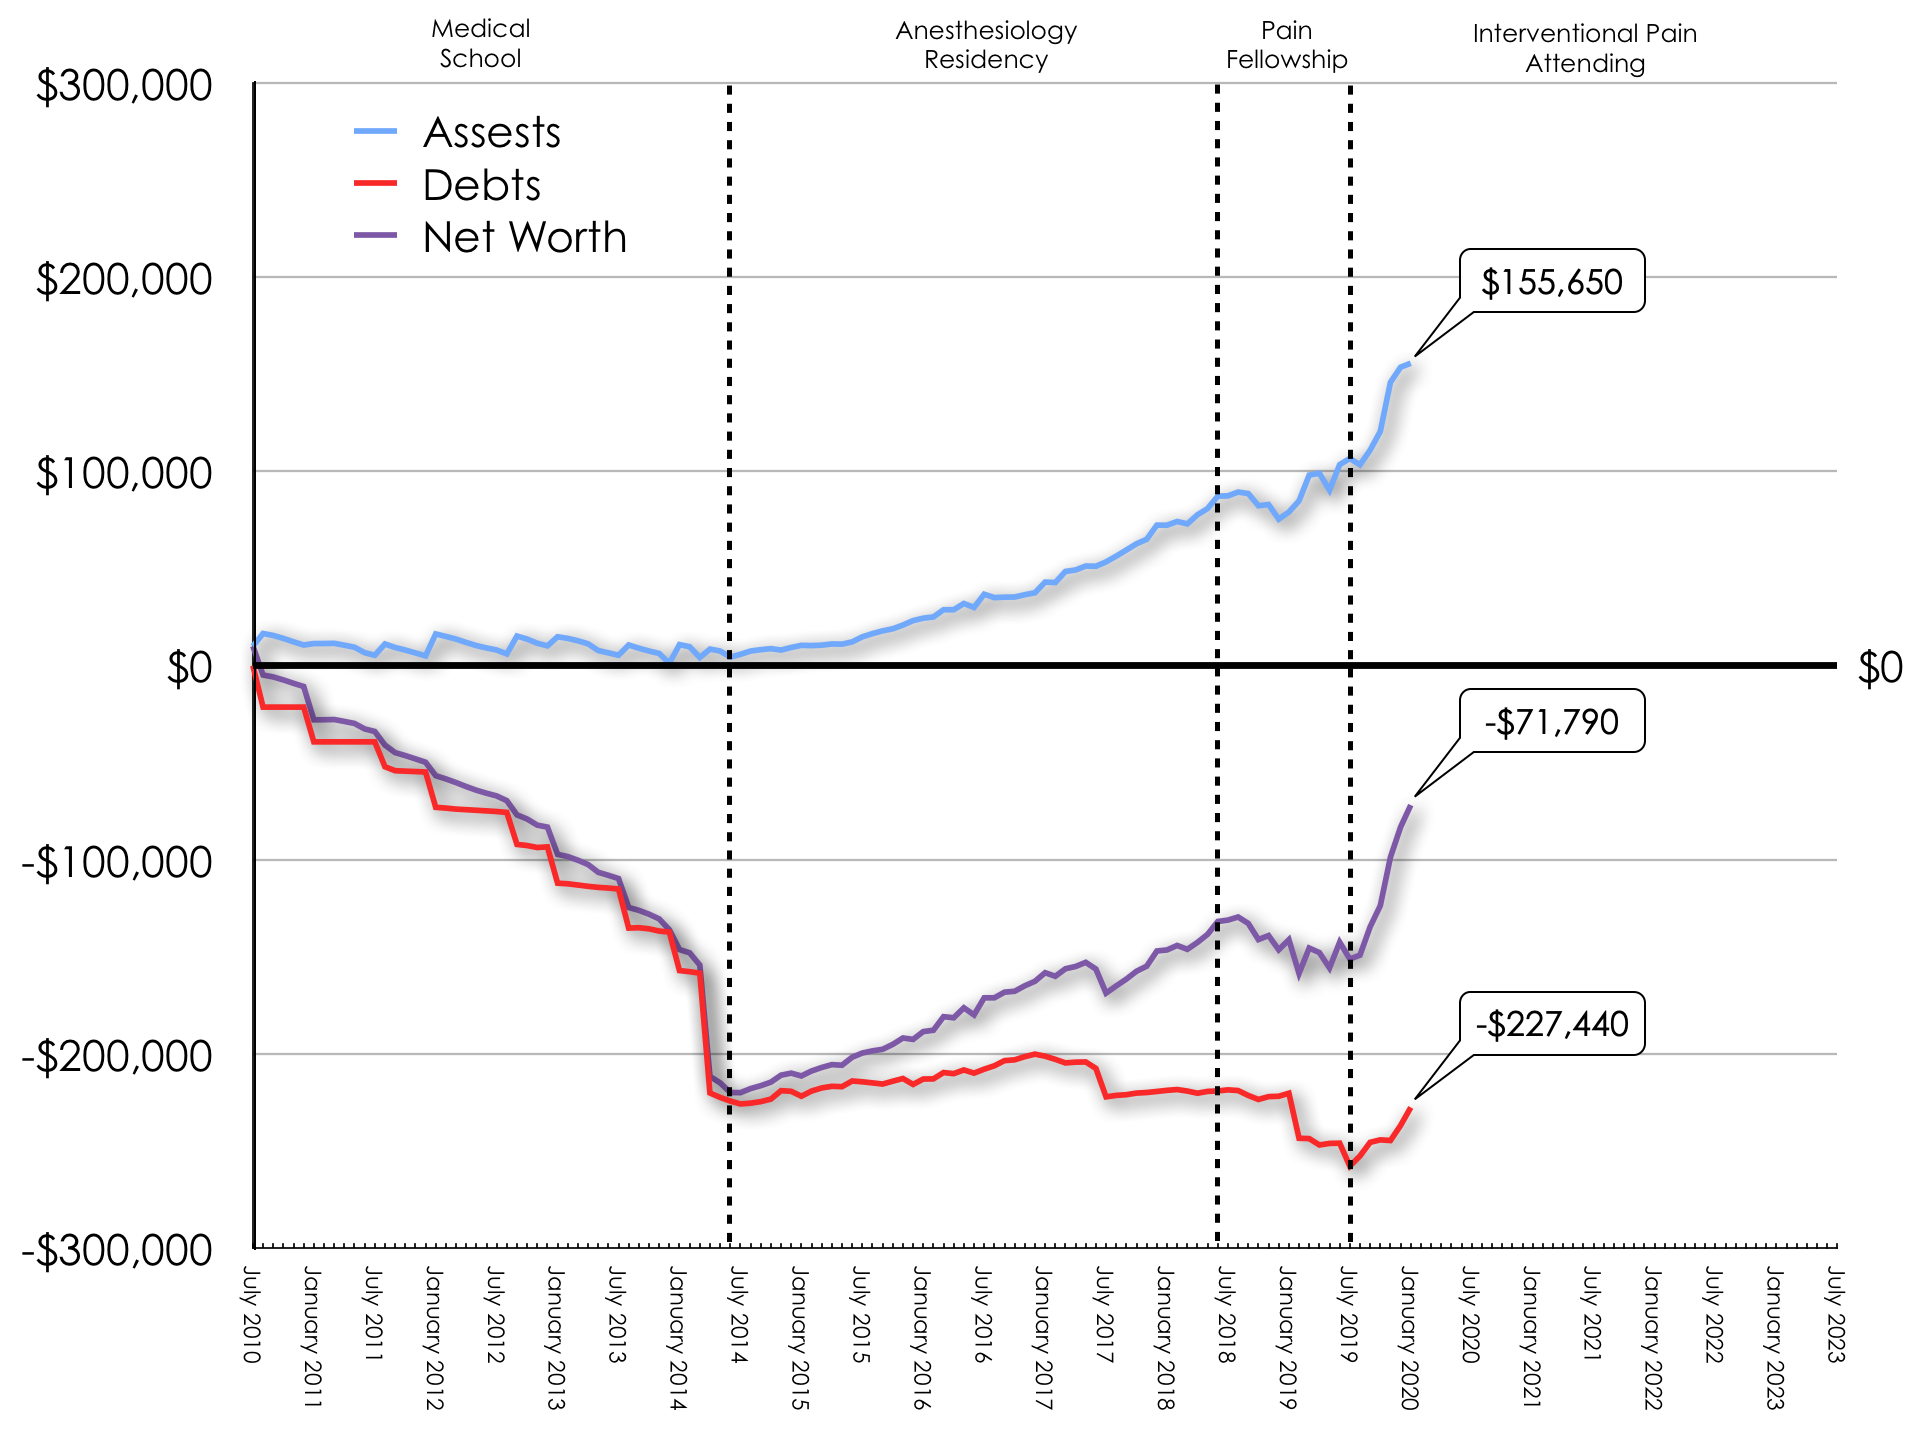 January 2020 Net Worth Trend